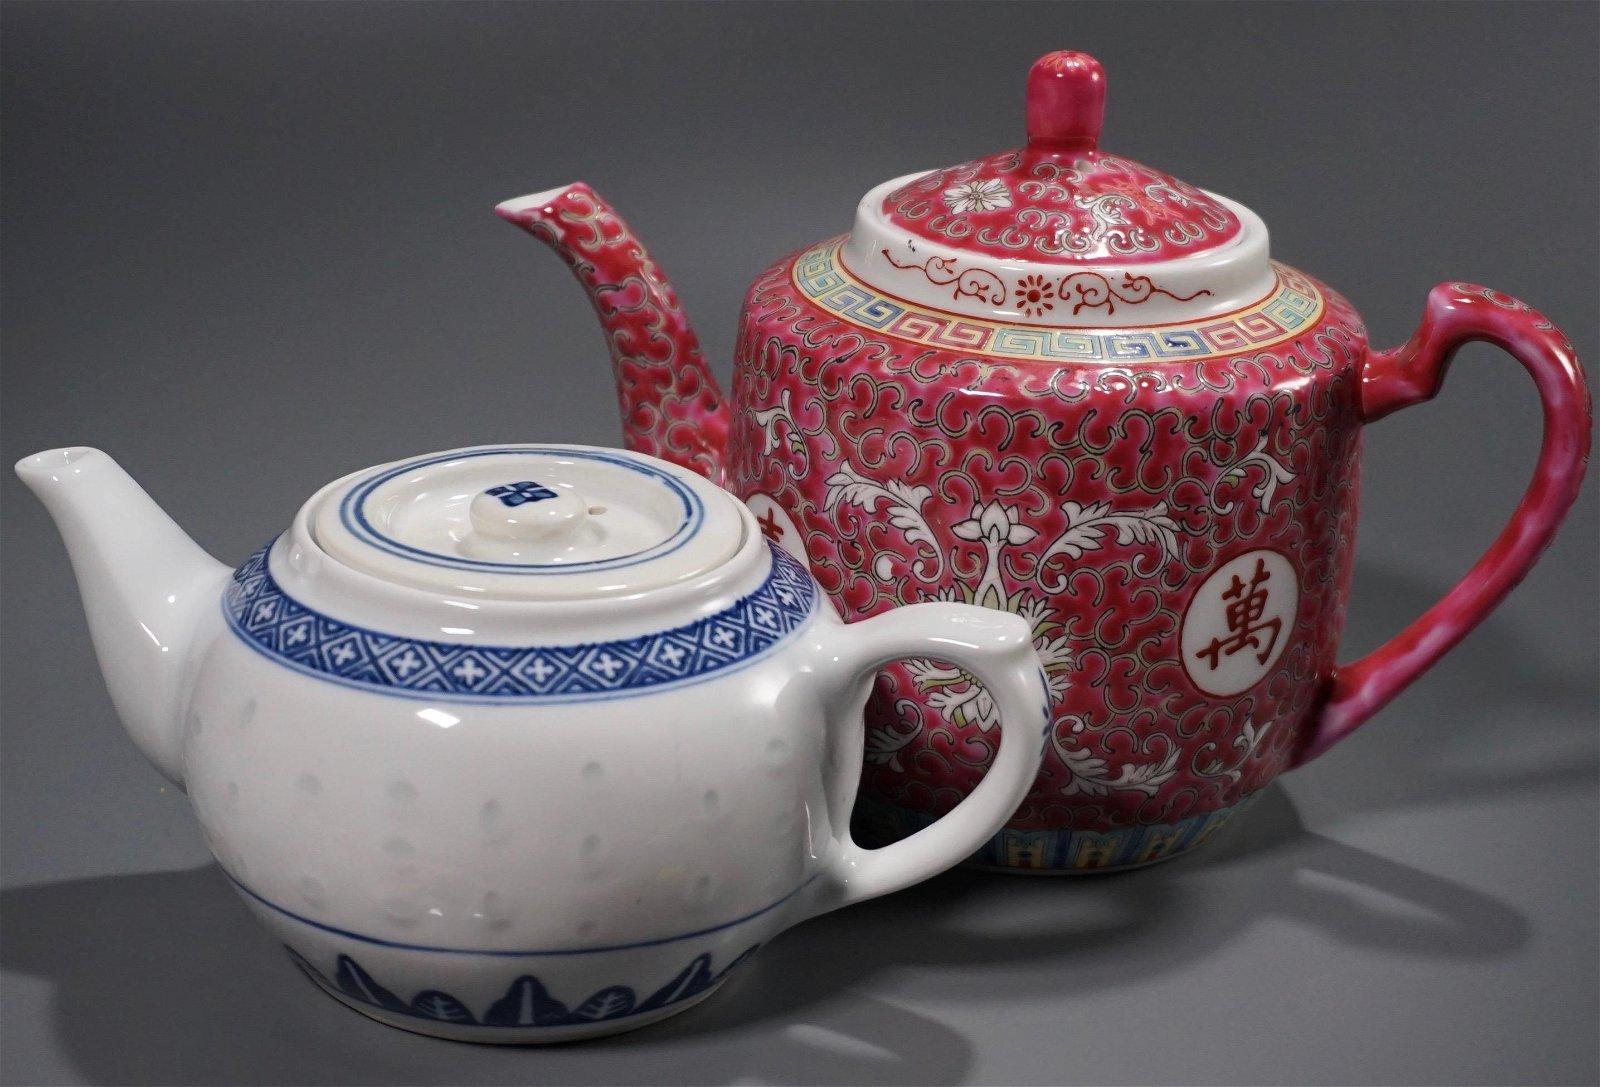 Chinnese PorcelainTeapots Lot of 2